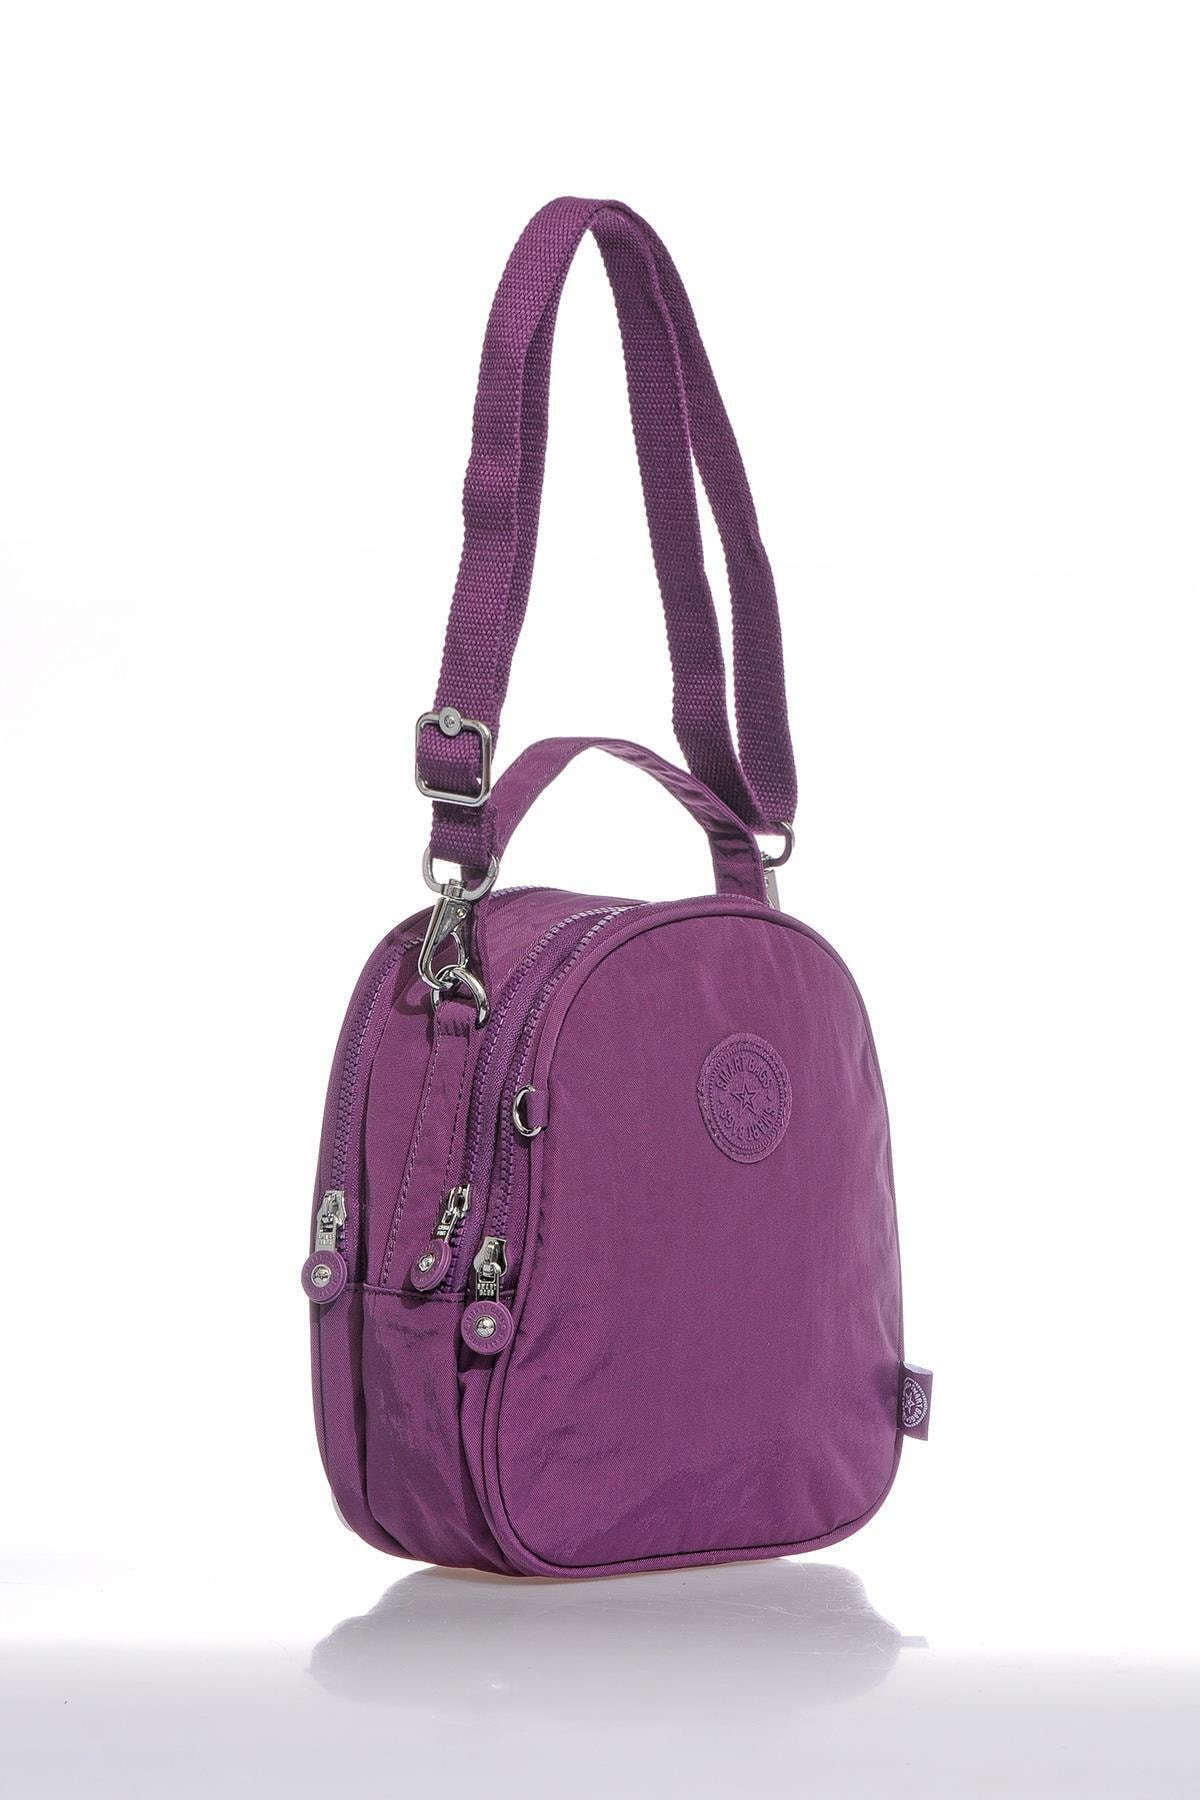 Smart Bags Smb3063-0027 Mor Kadın Sırt Çantası